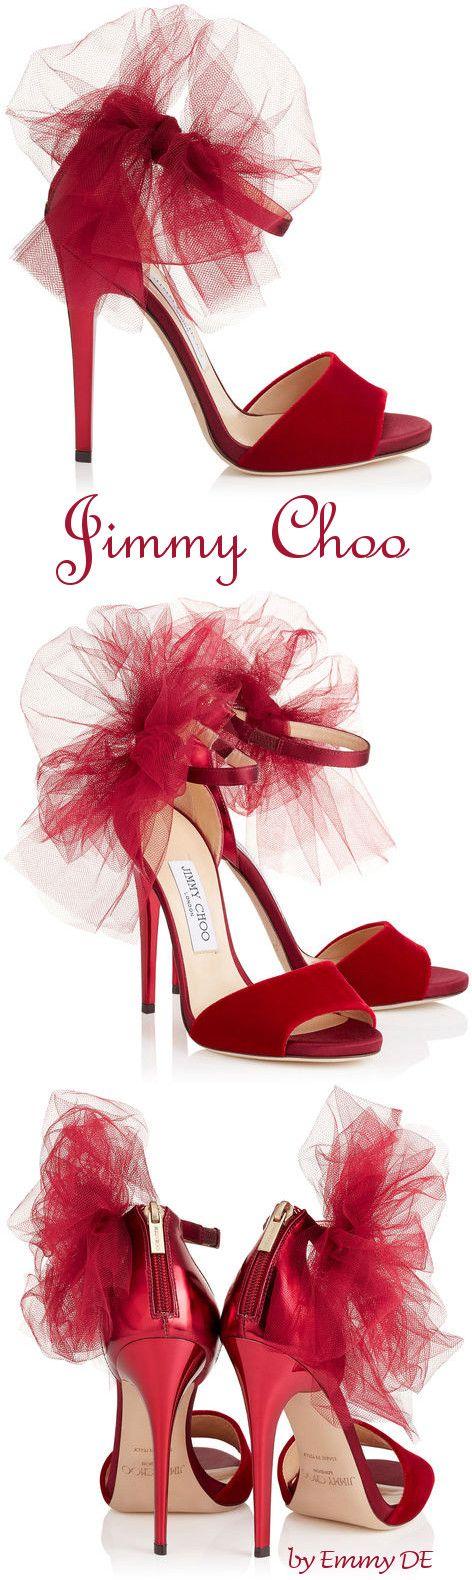 Zapatos Jimmy Choo Rojos